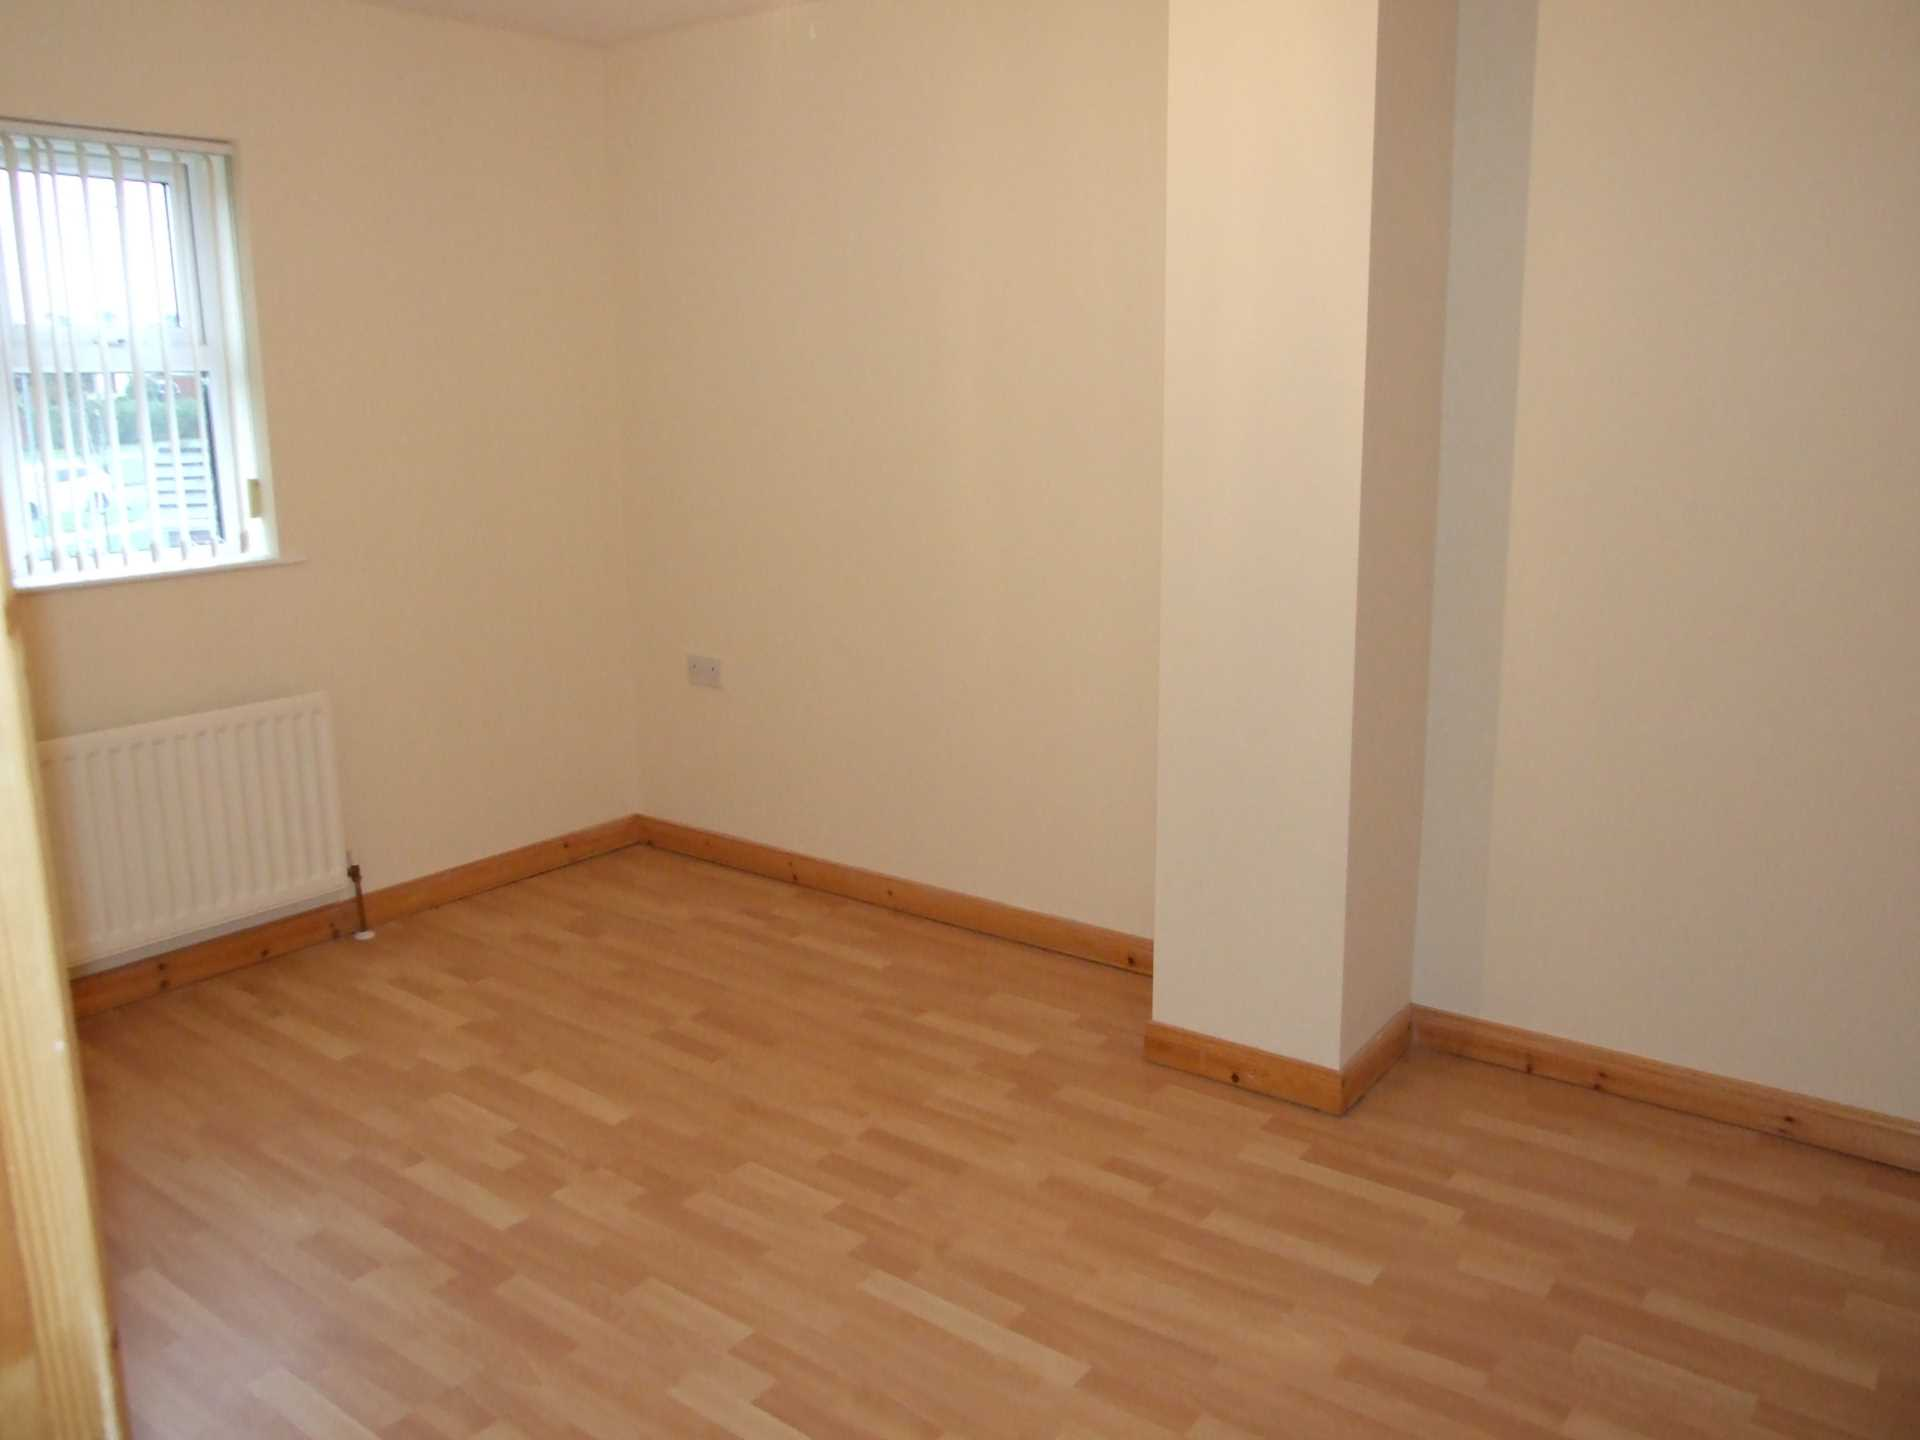 Room For Rent In Craigavon